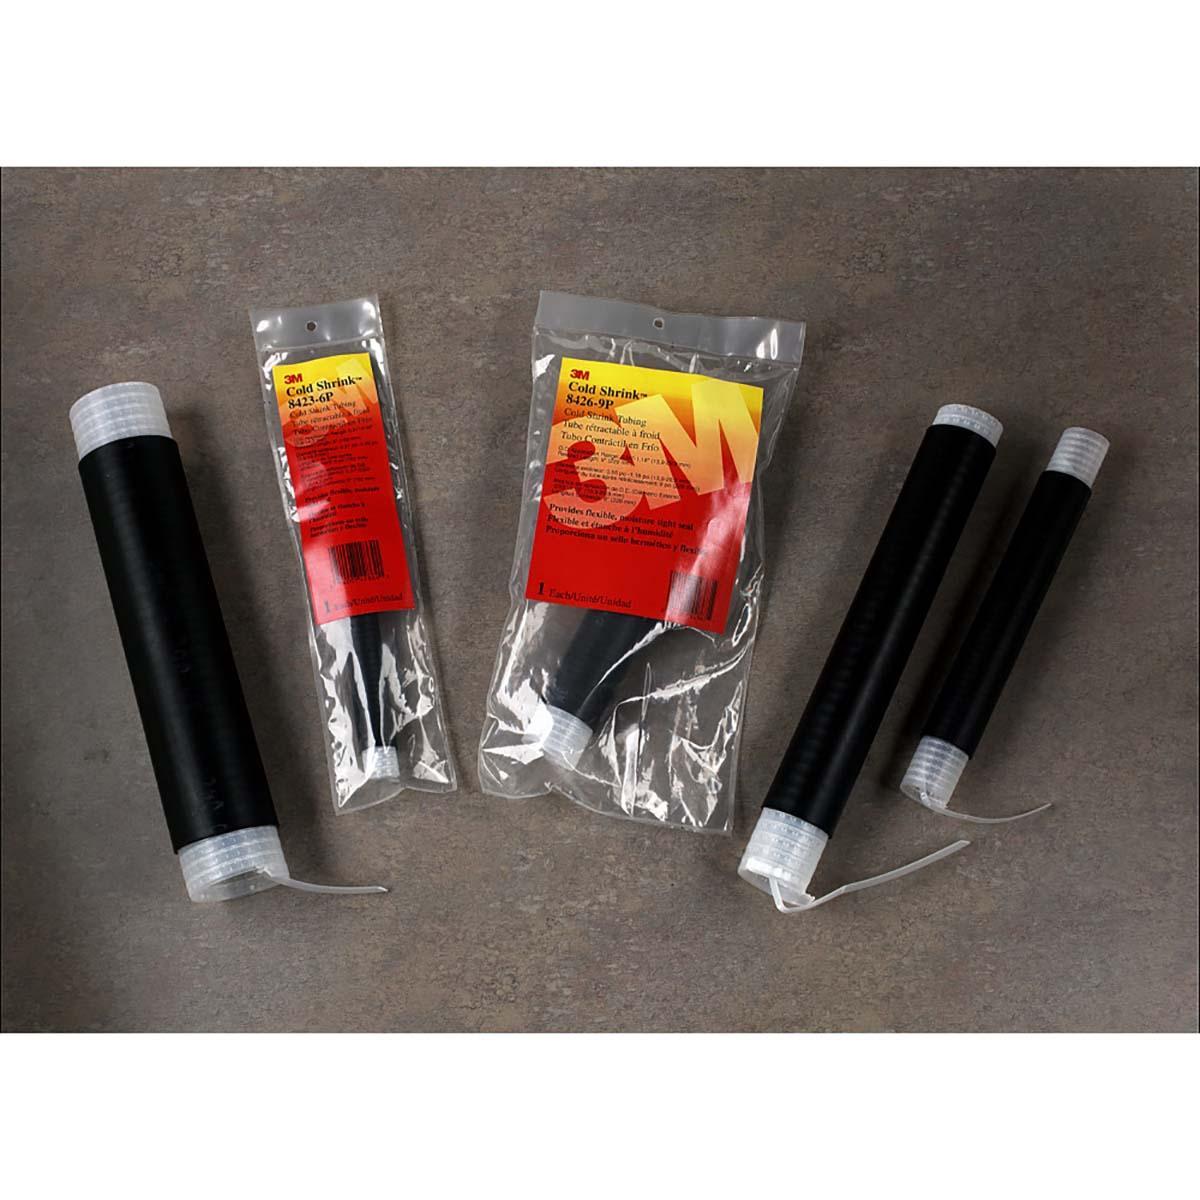 3M(TM) Cold Shrink Insulator 8430-18  1250-2000 kcmil  10 per case